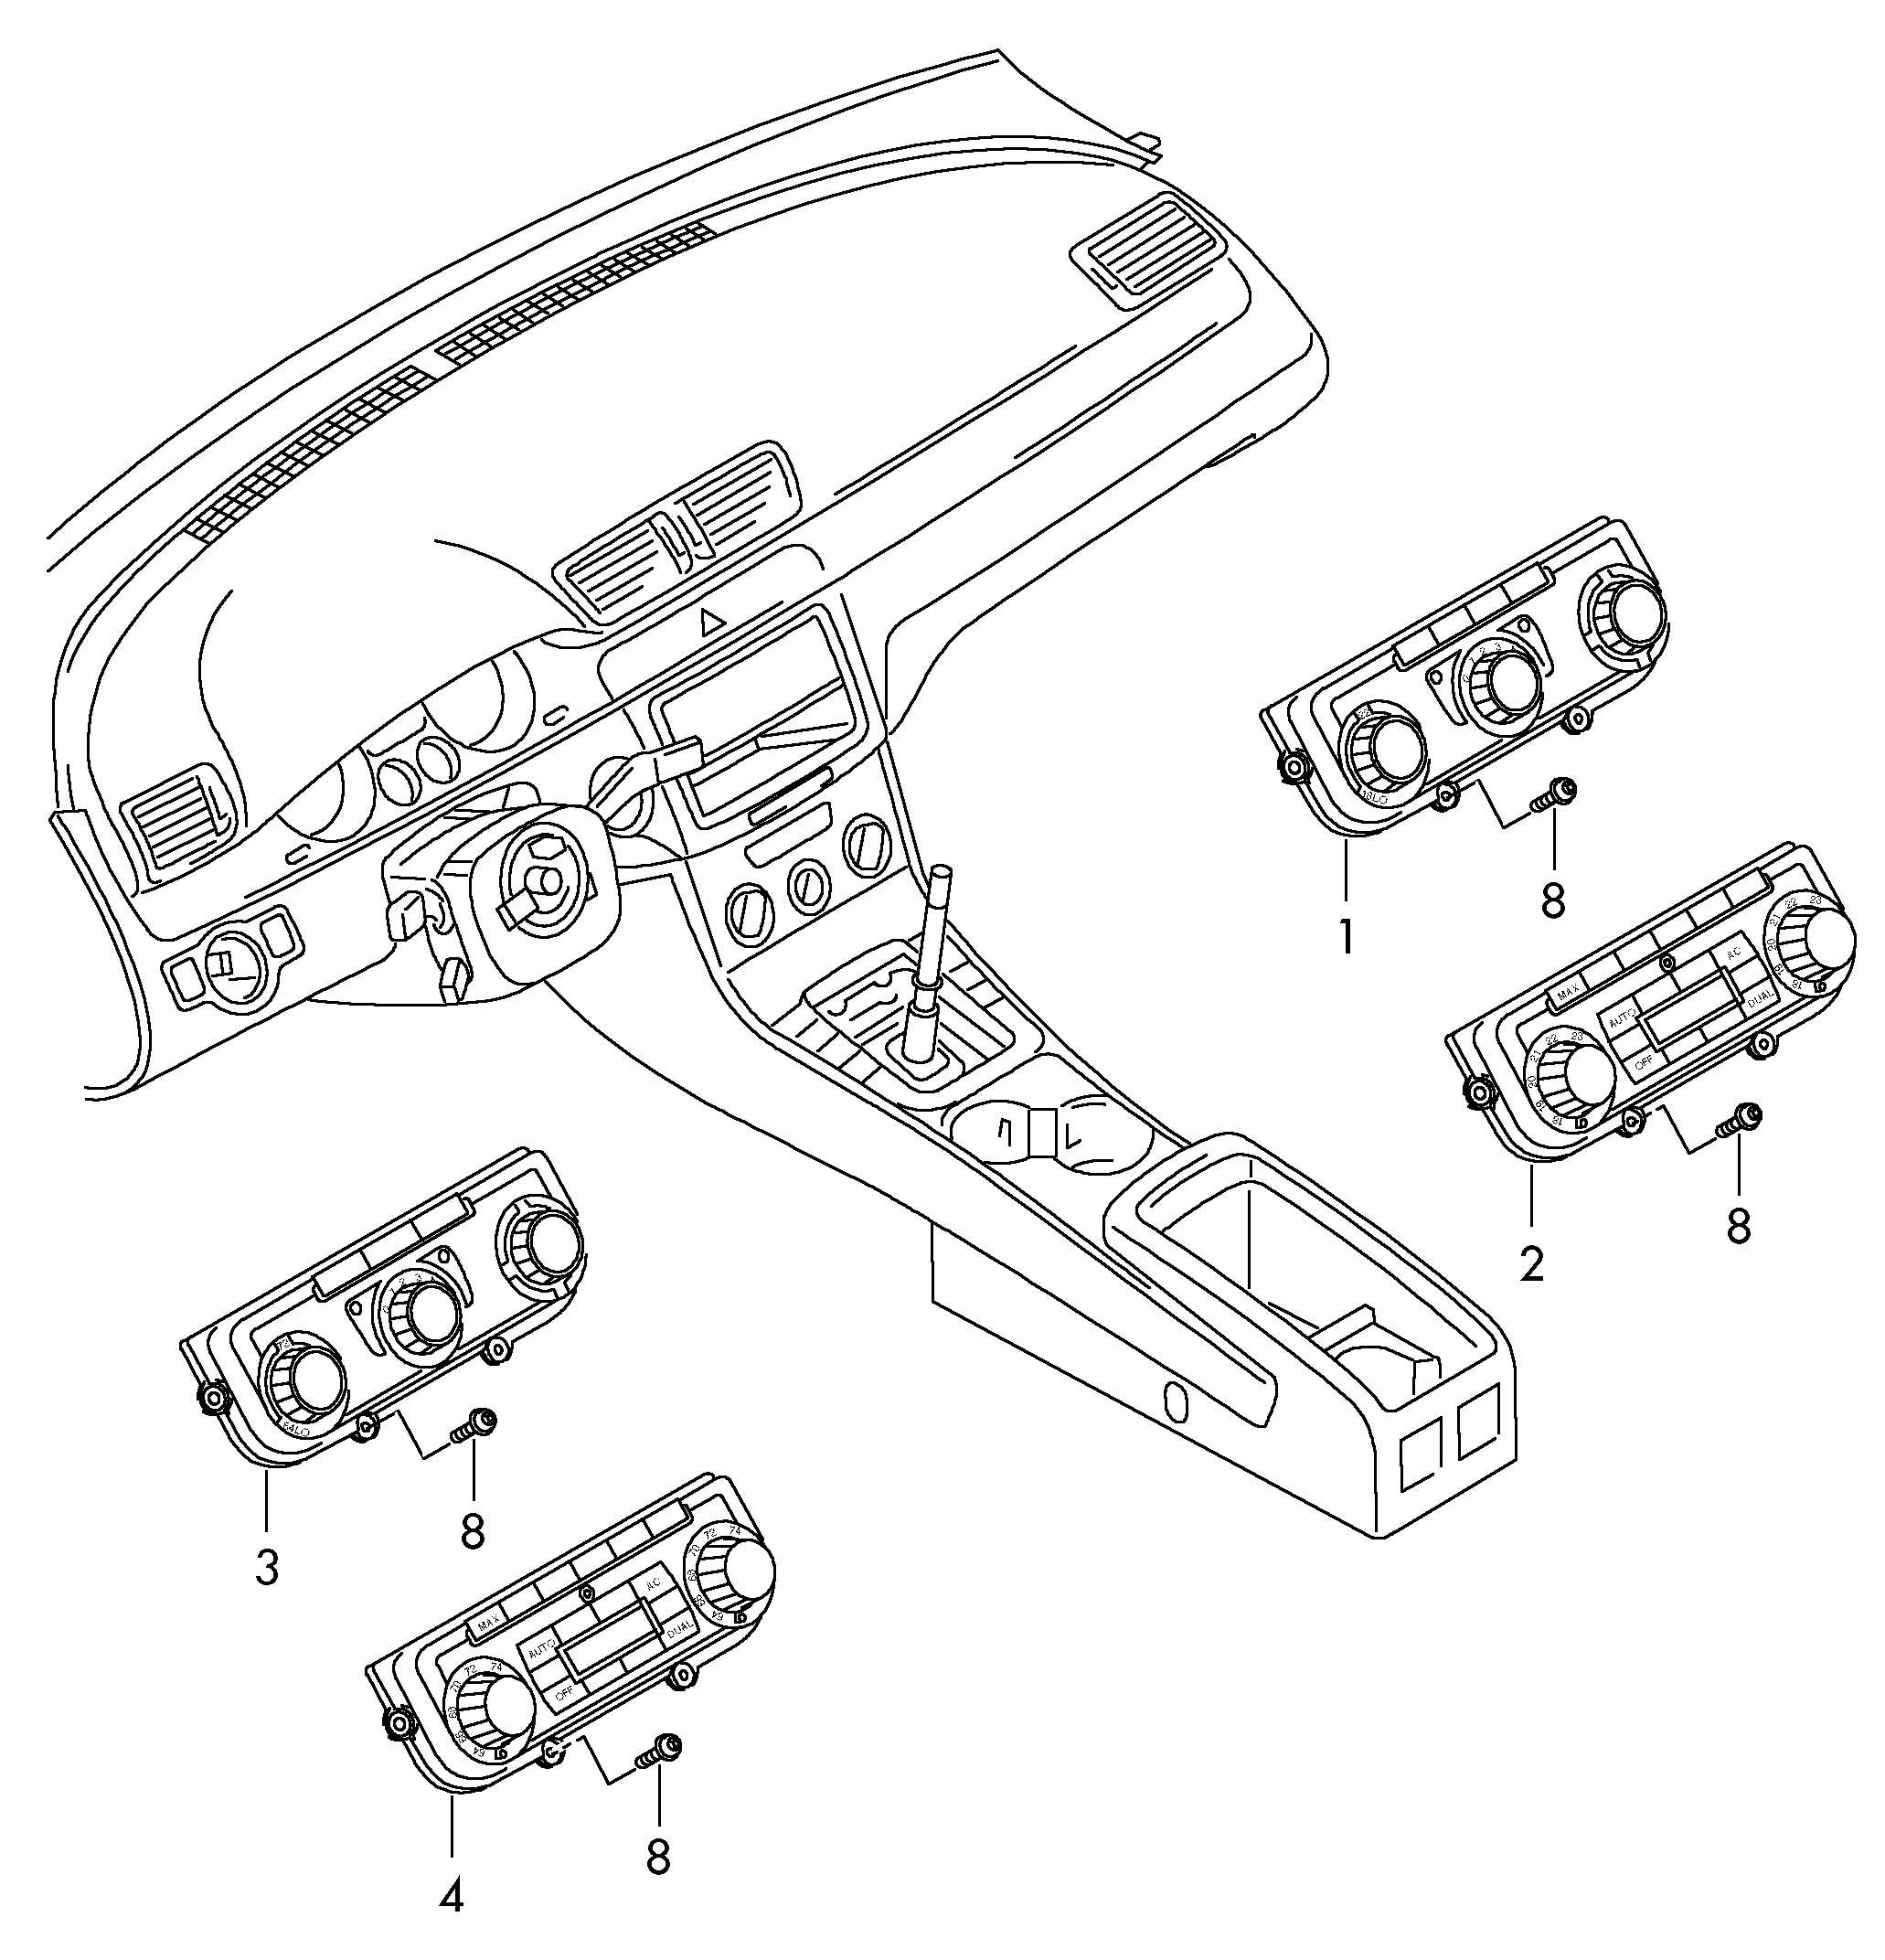 Volkswagen Vw Passat Cc Display And Operating Unit Display And Operating Unit For Electr